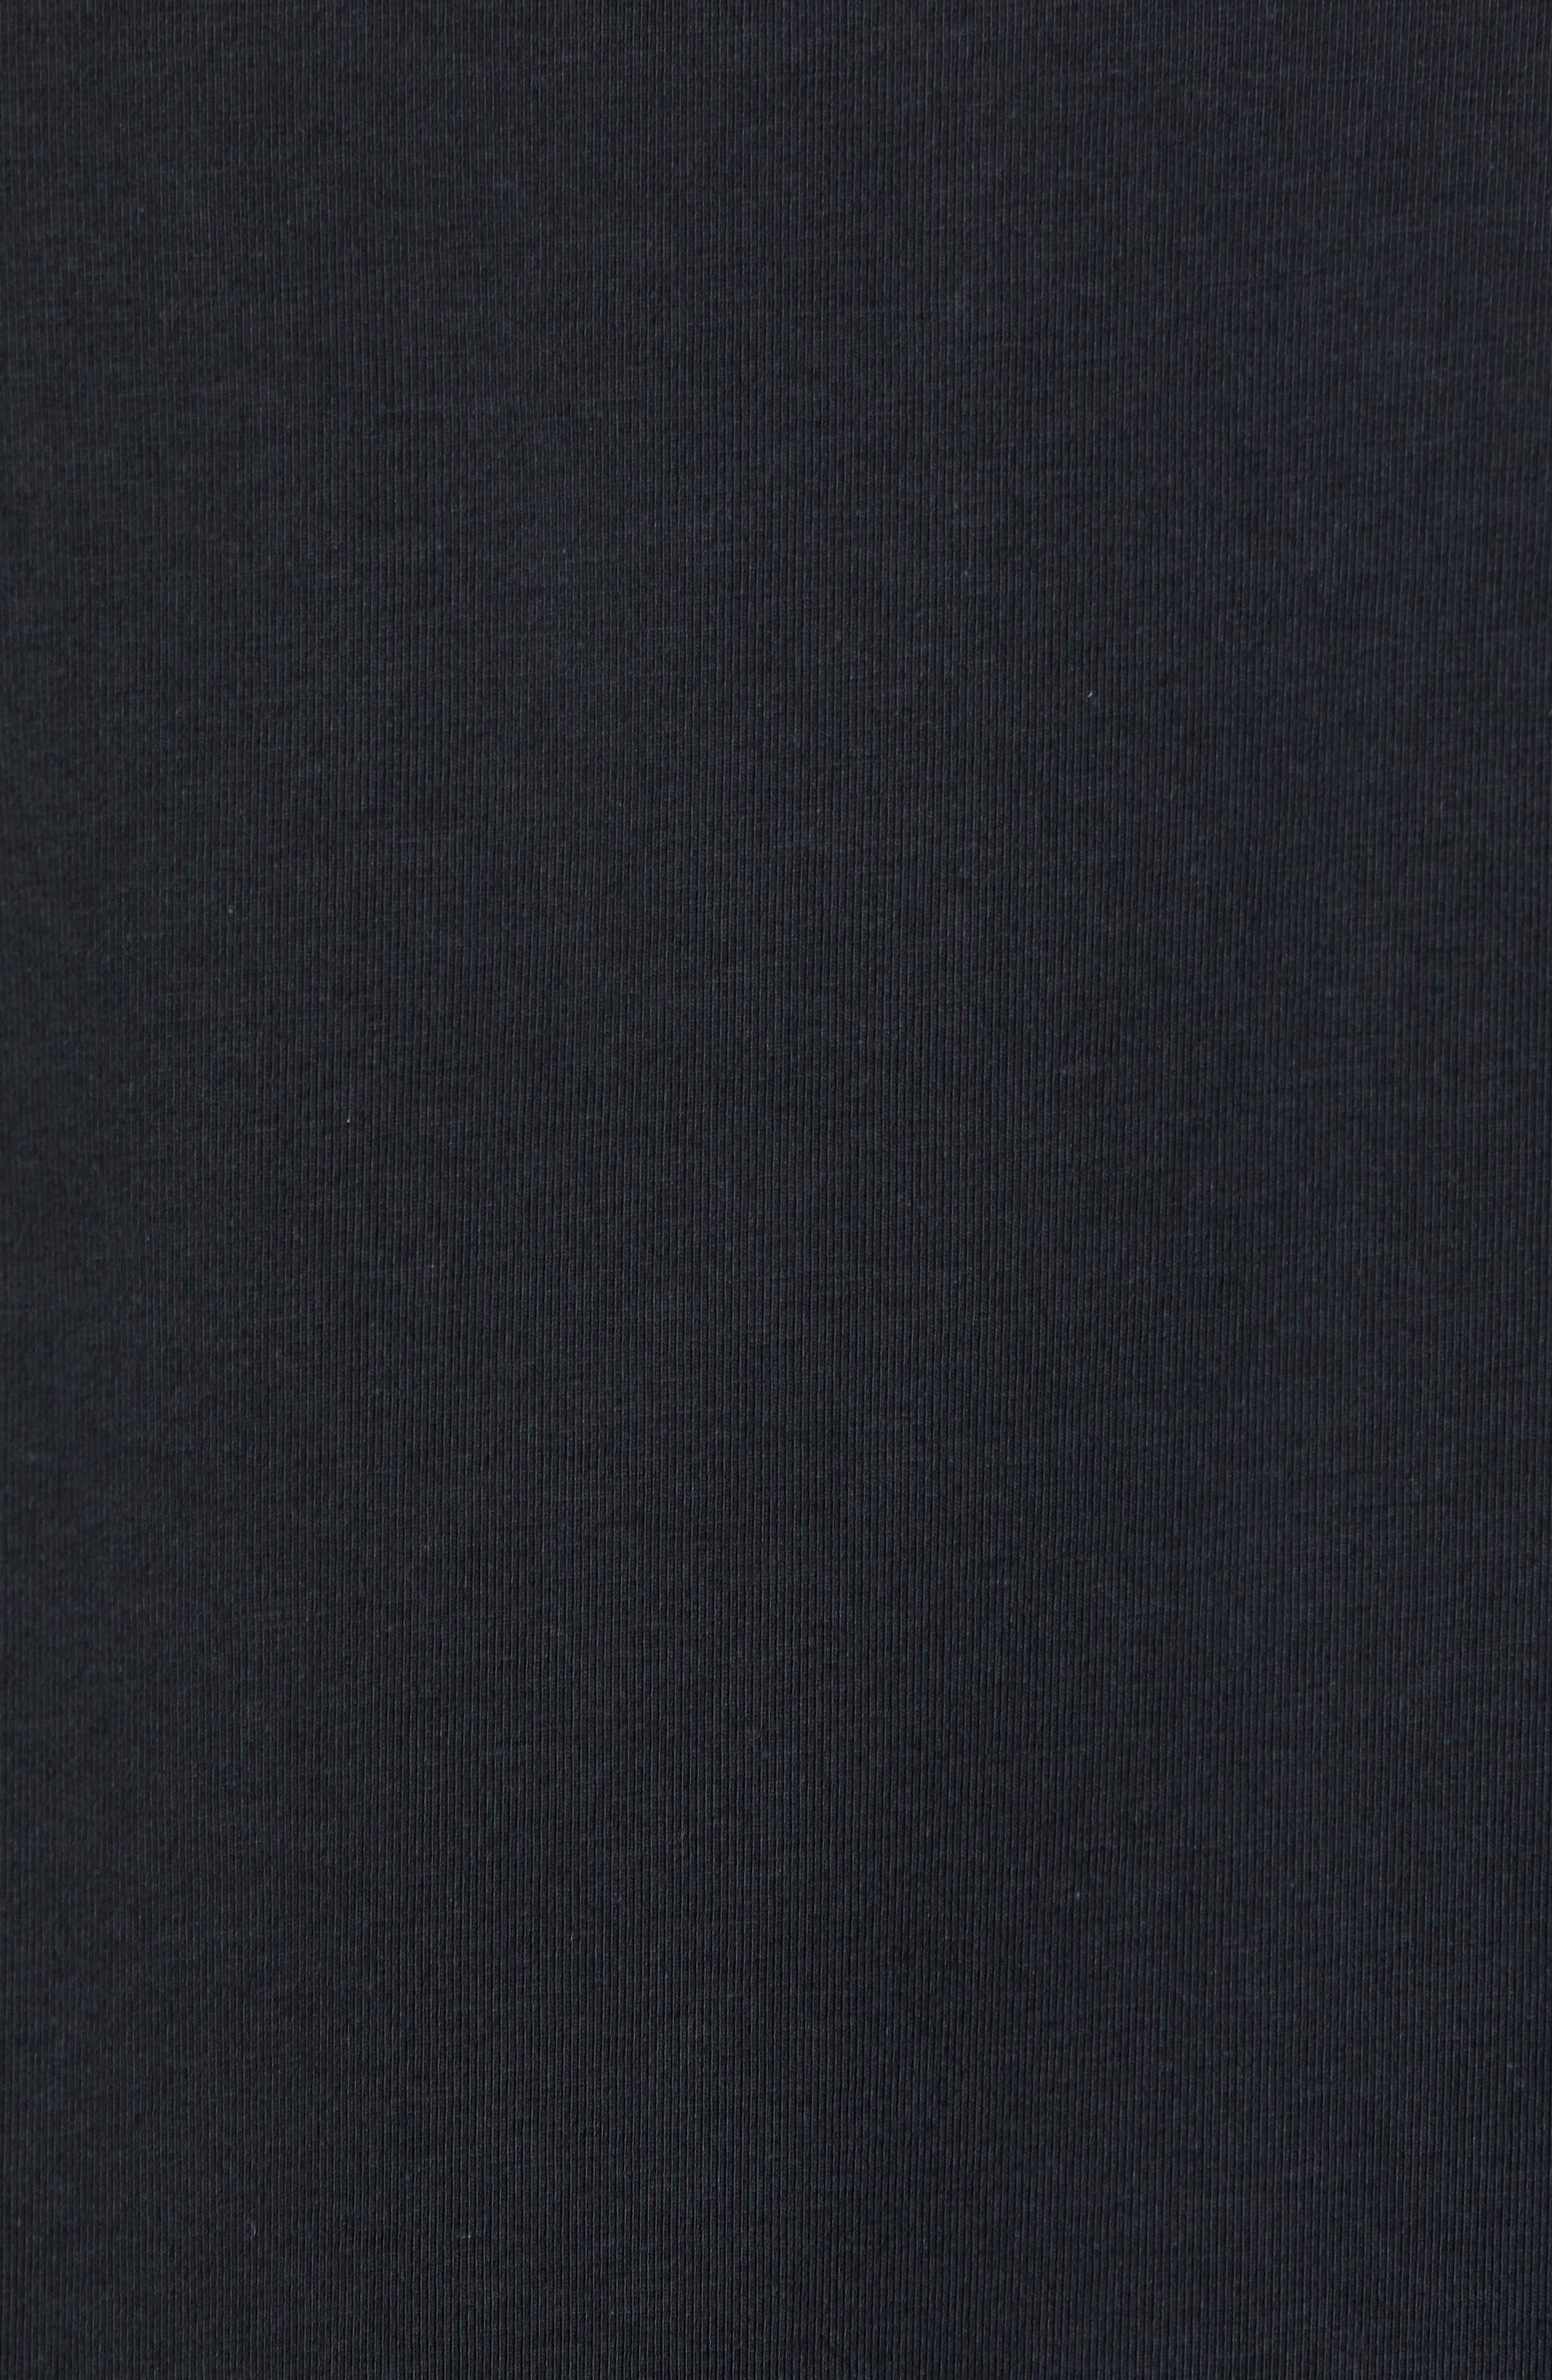 BOBBY JONES,                             Liquid Cotton Stretch Jersey Polo,                             Alternate thumbnail 5, color,                             BLACK